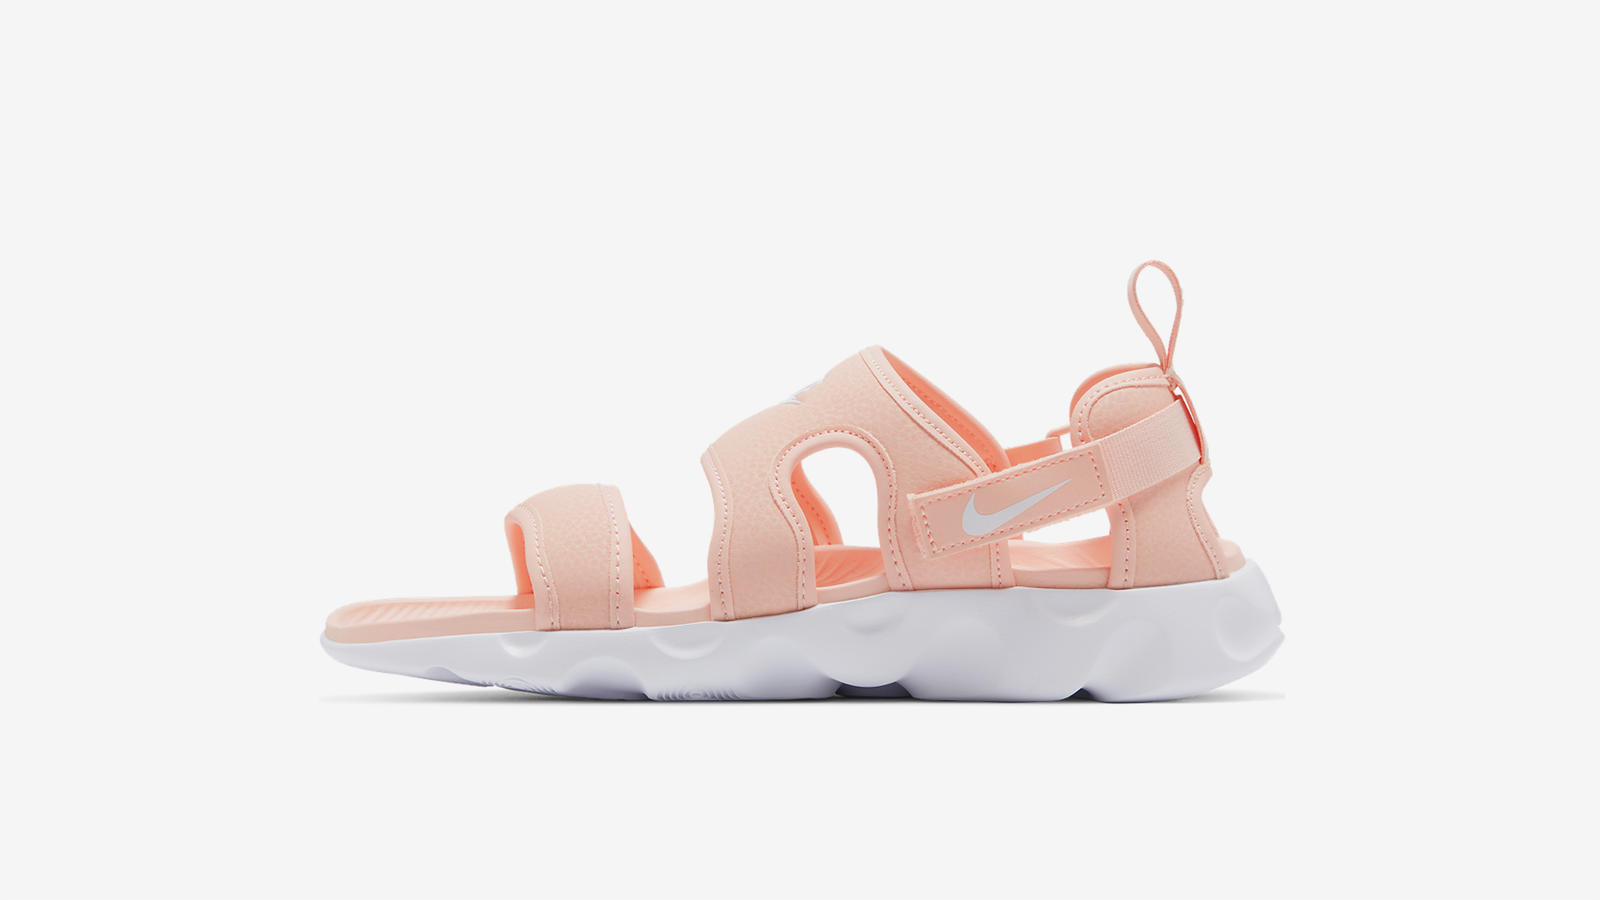 Nike Sportswear Summer 2020 Sandals Nike Canyon Nike Asuna Nike Owaysis 6